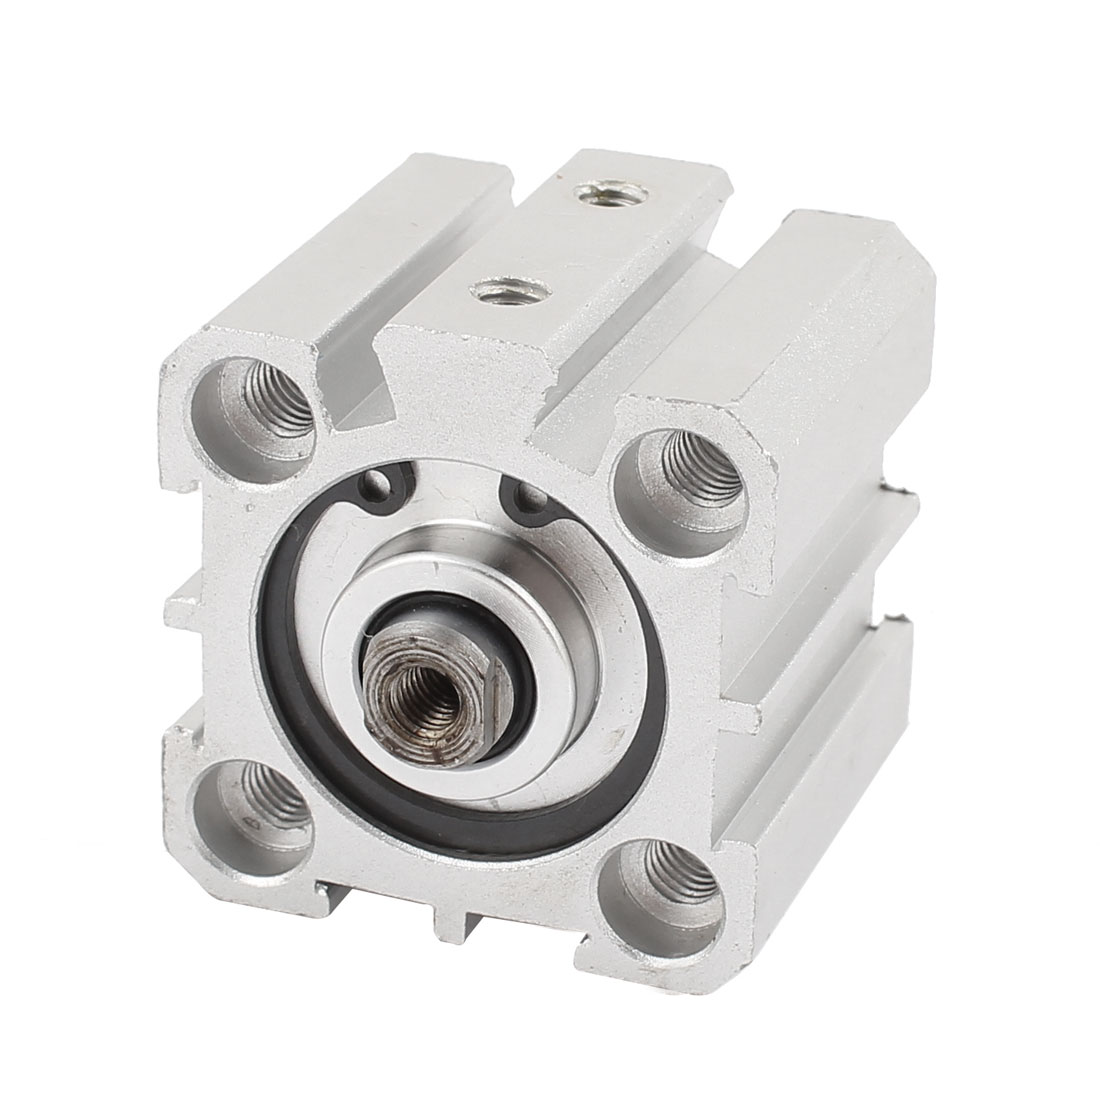 KSDA25x15 15mm Stroke 25mm Bore Aluminium Pneumatic Compact Air Cylinder